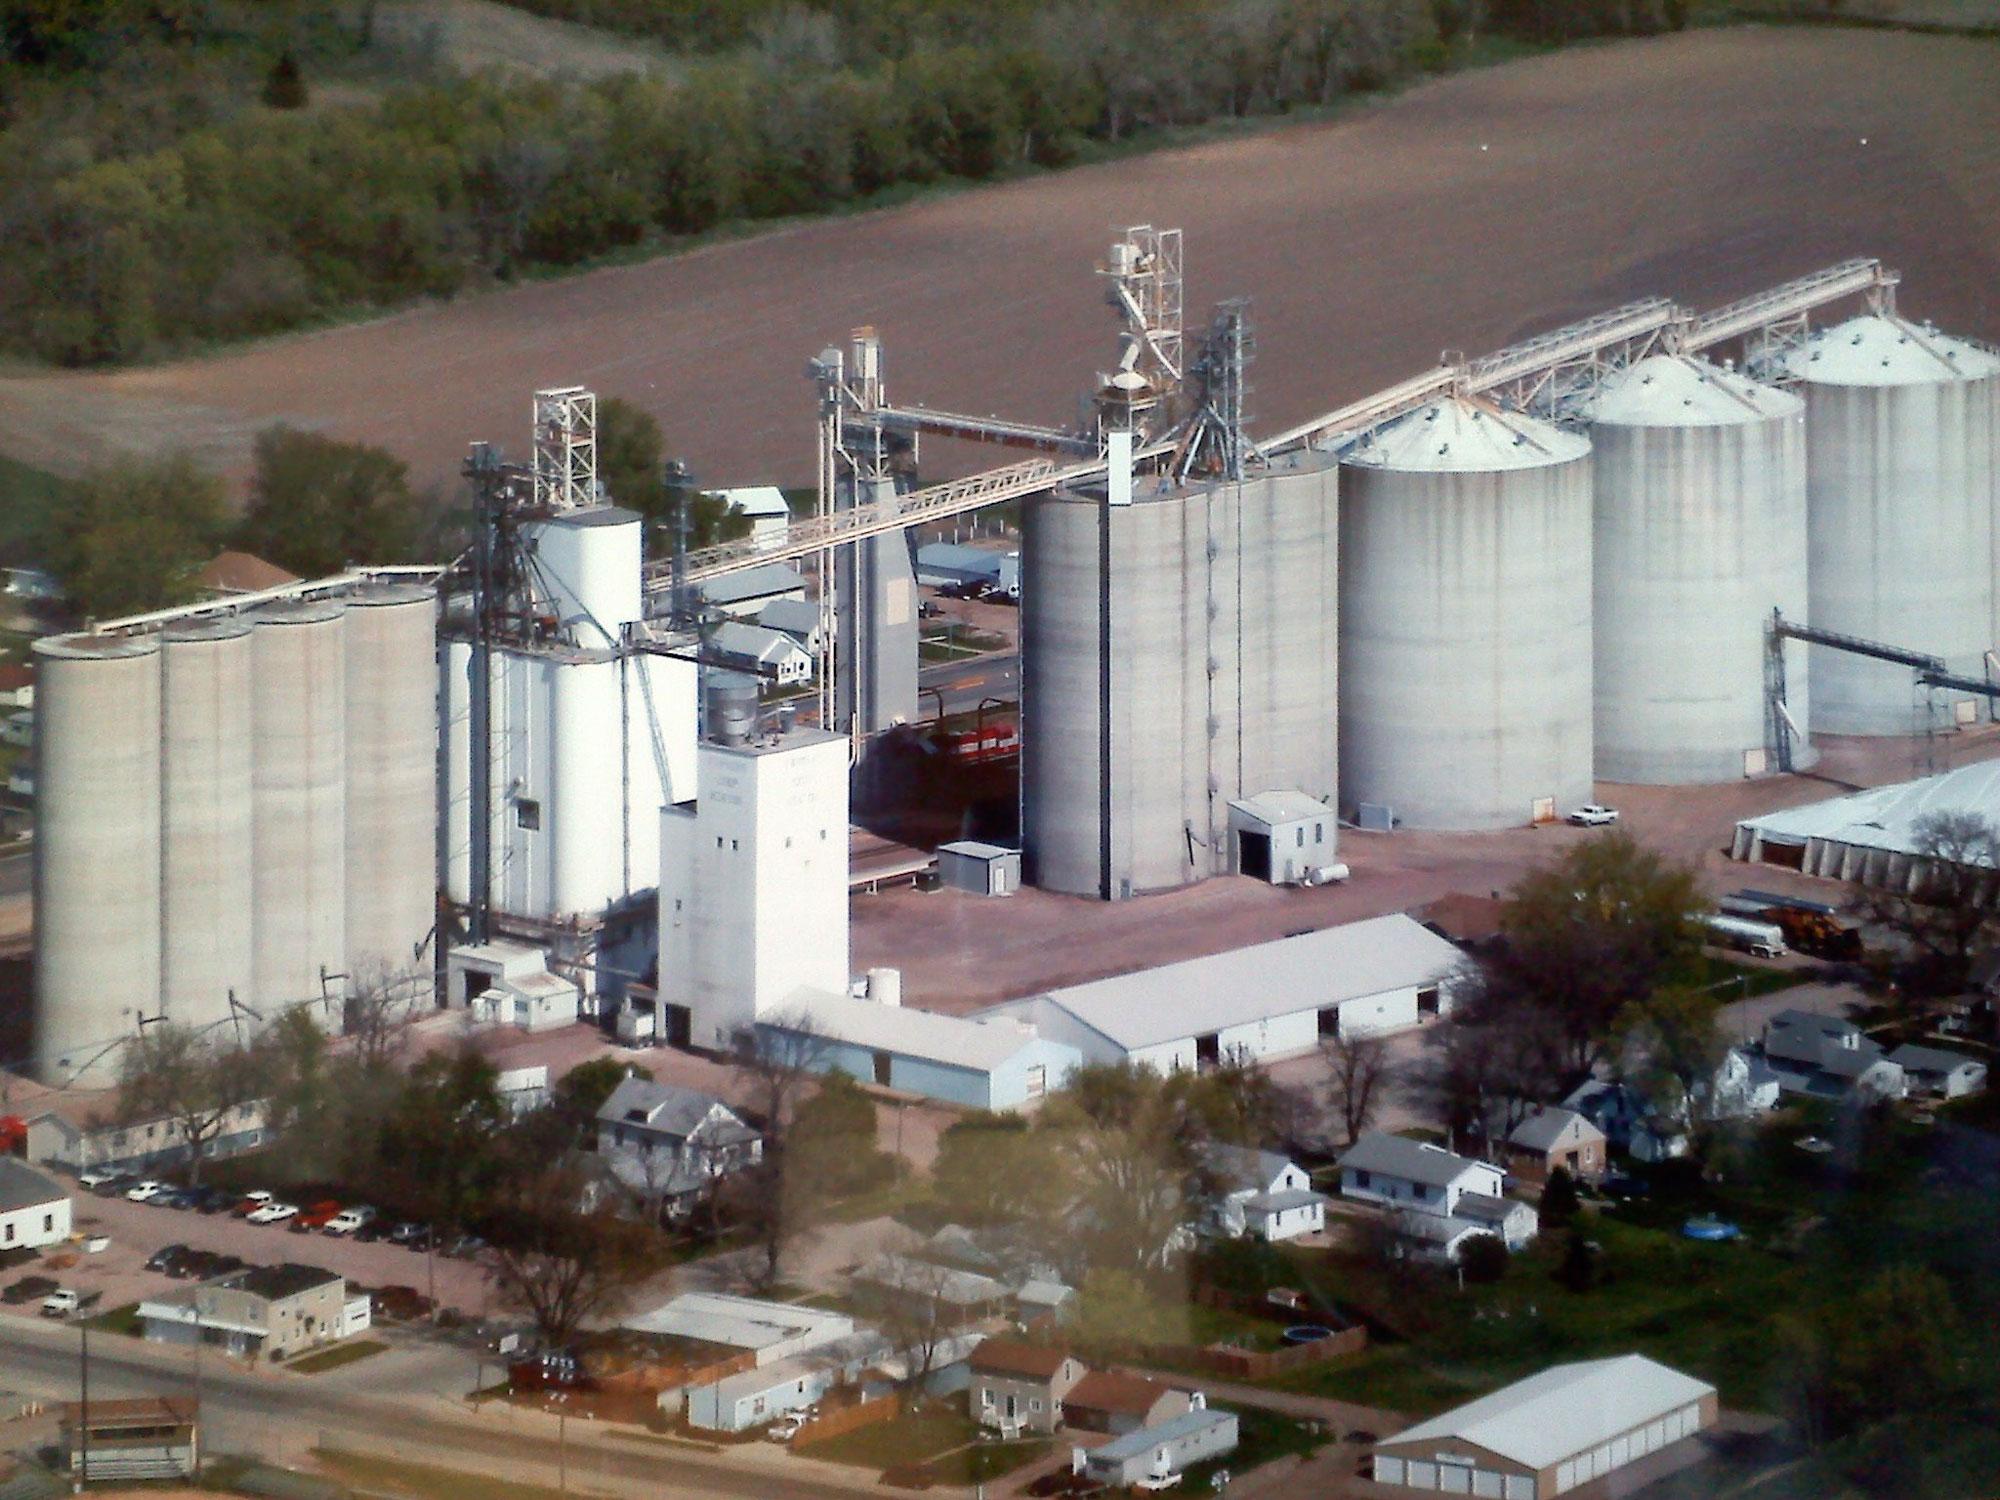 The FCC Hinton, IA location has 4.8 million bushels of concrete upright storage.